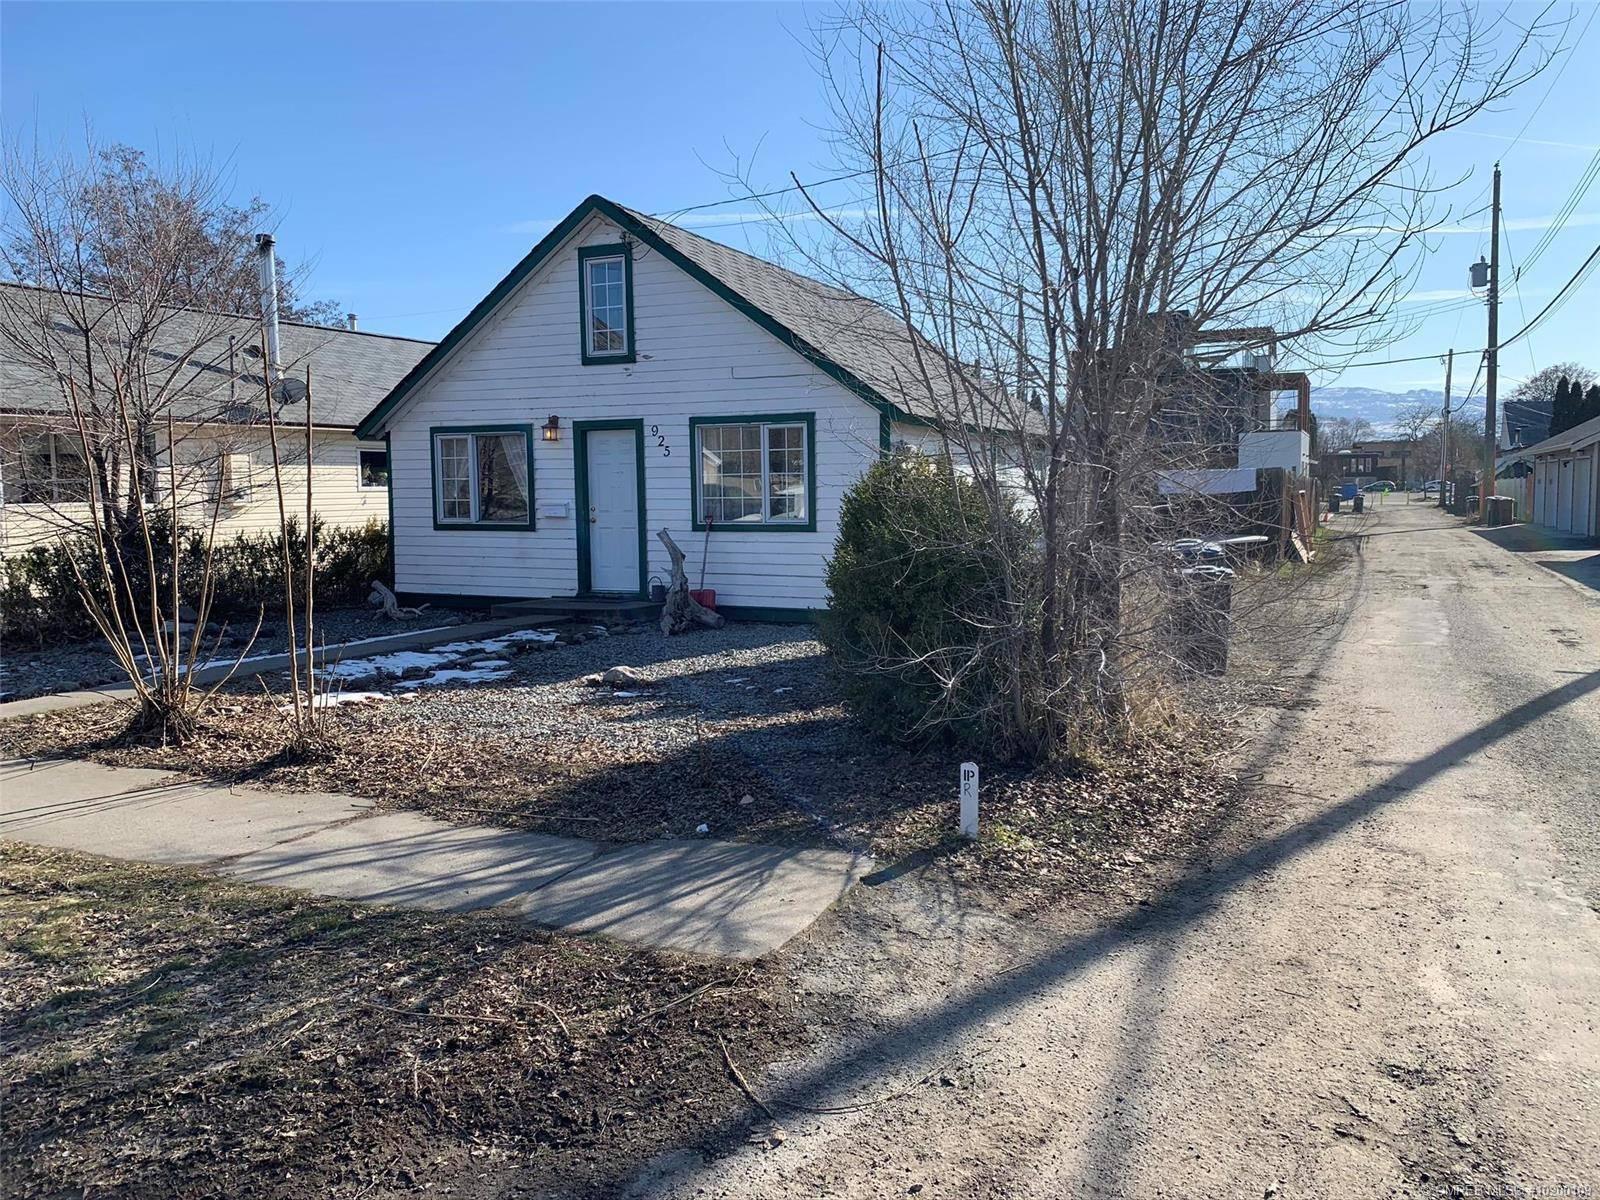 House for sale at 925 Coronation Ave Kelowna British Columbia - MLS: 10200109